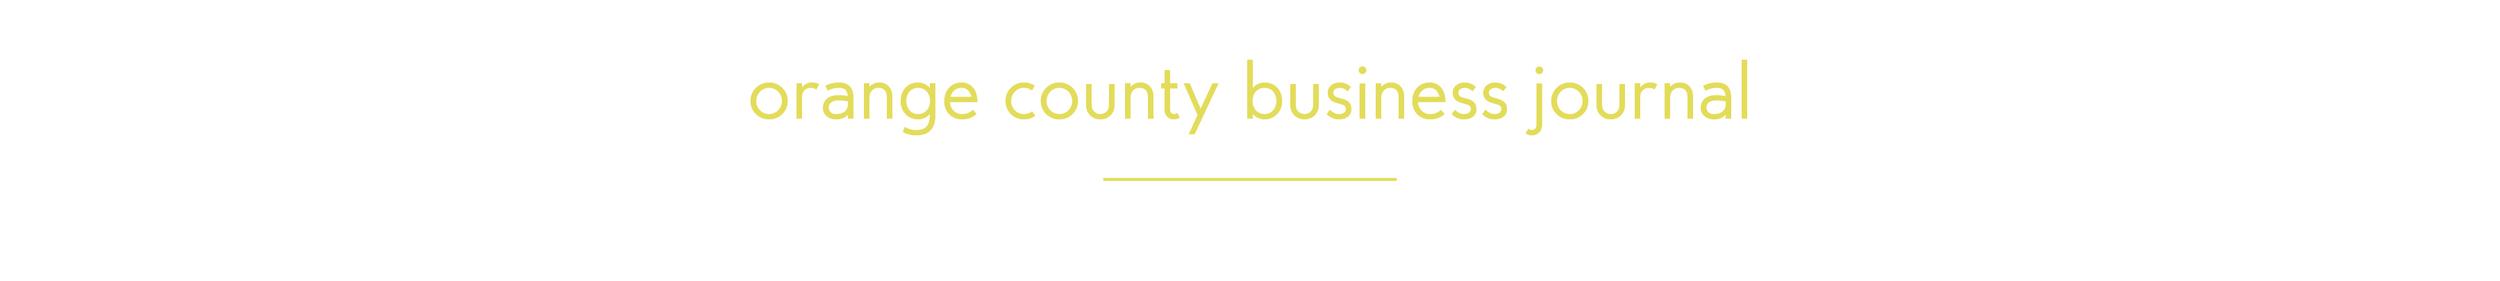 OC Business Journal.jpg